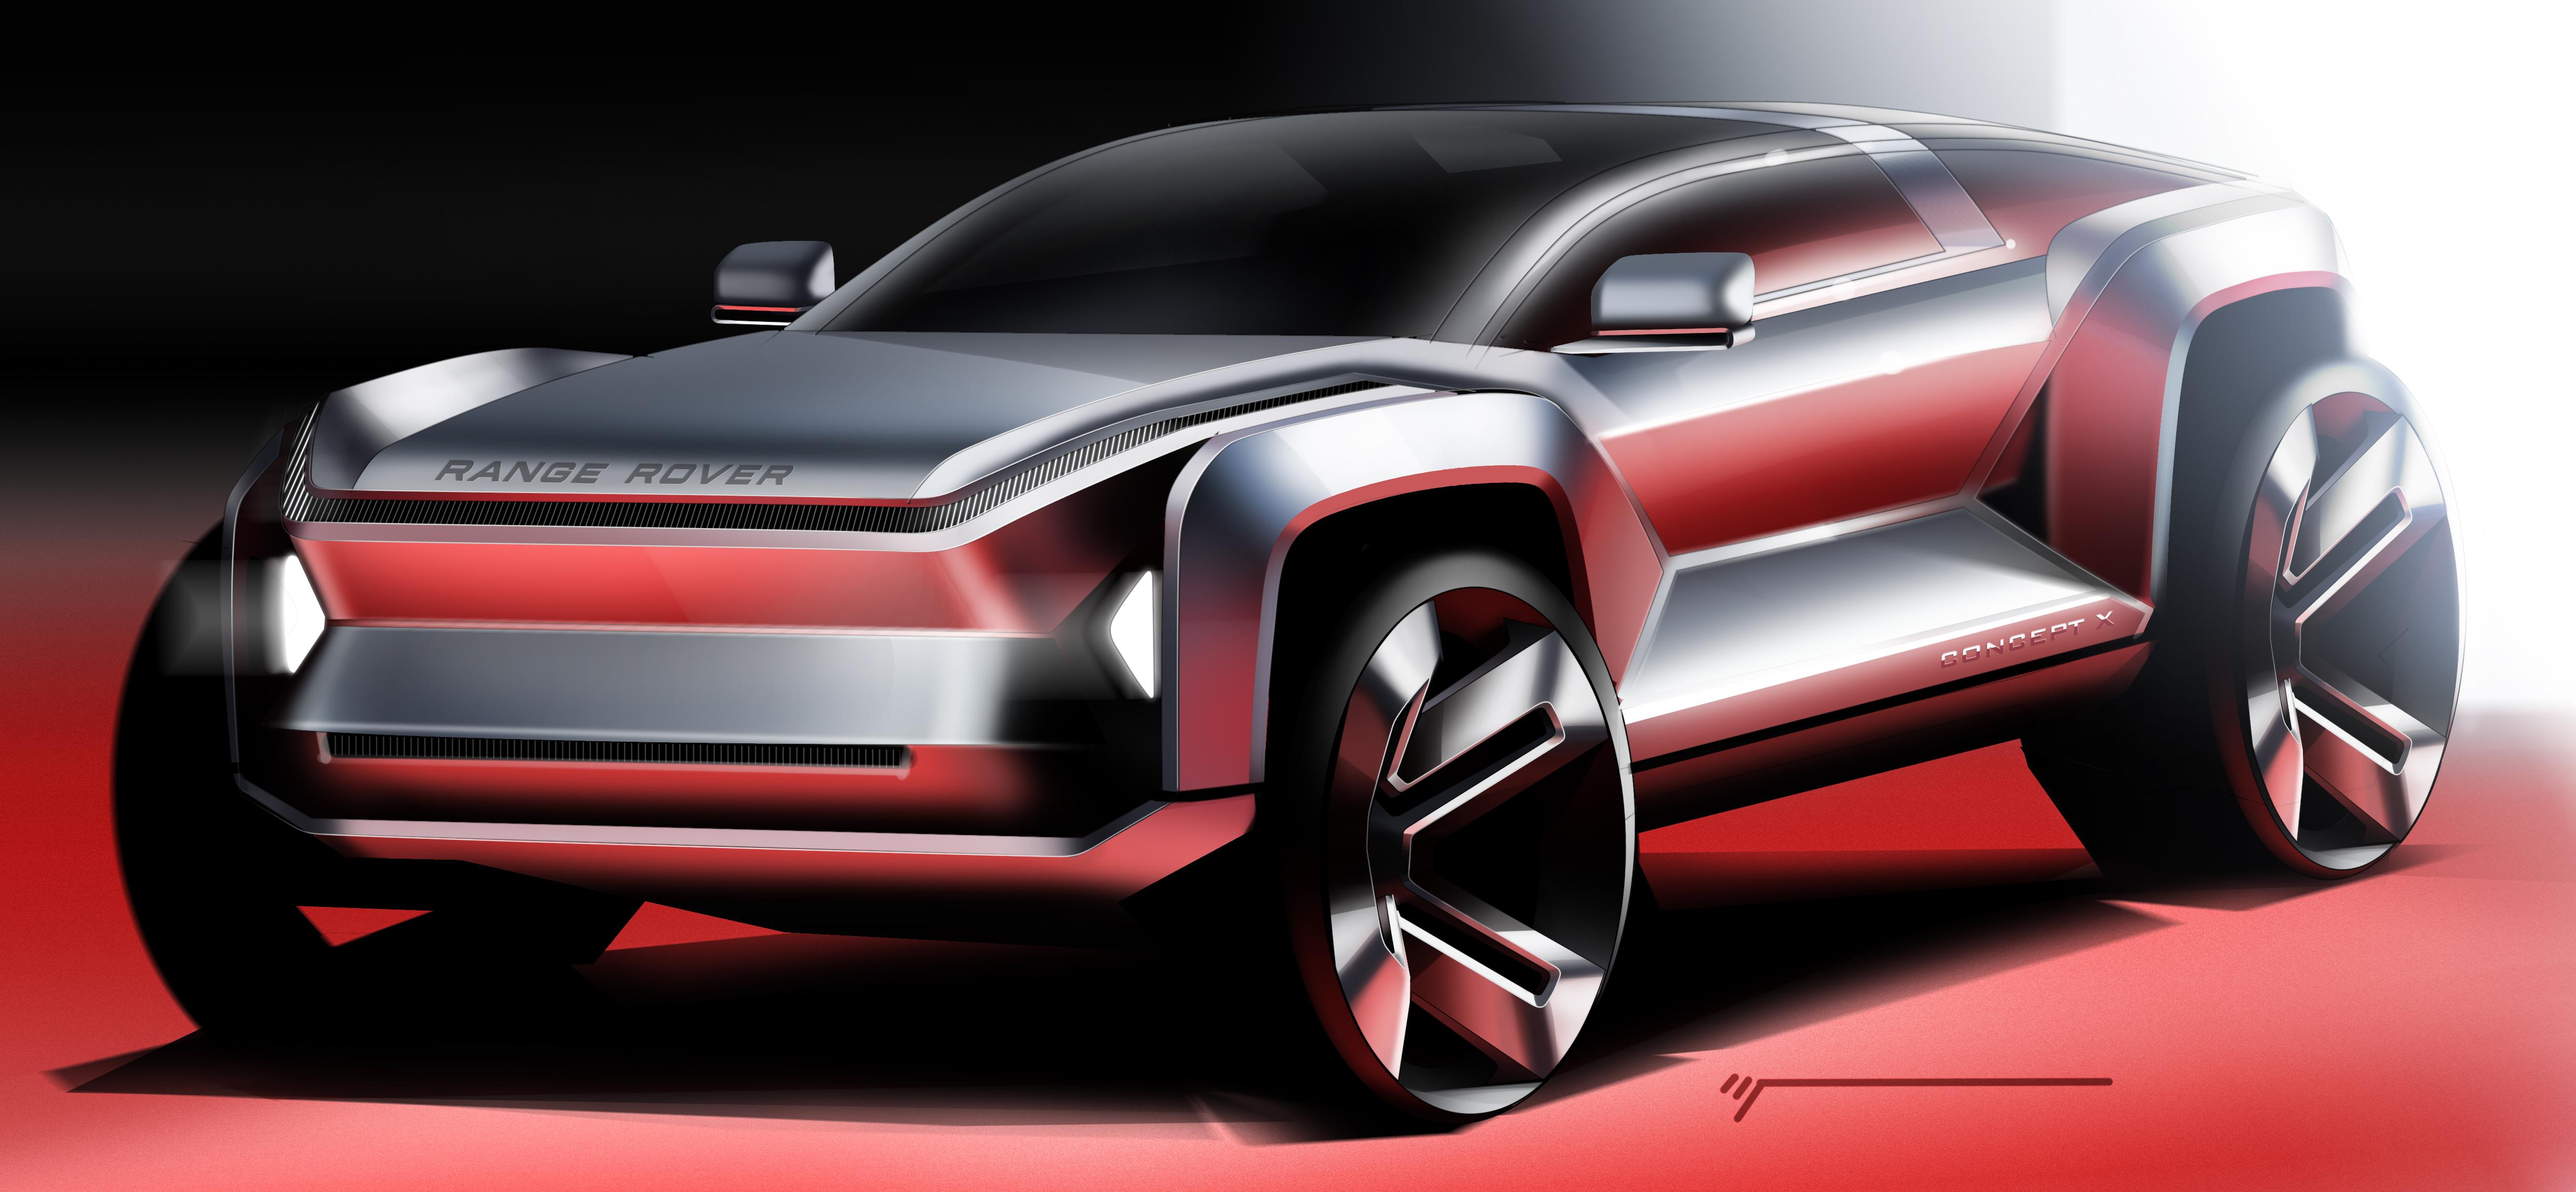 Range Rover Concept X – Tomas Ivaskevicius Design